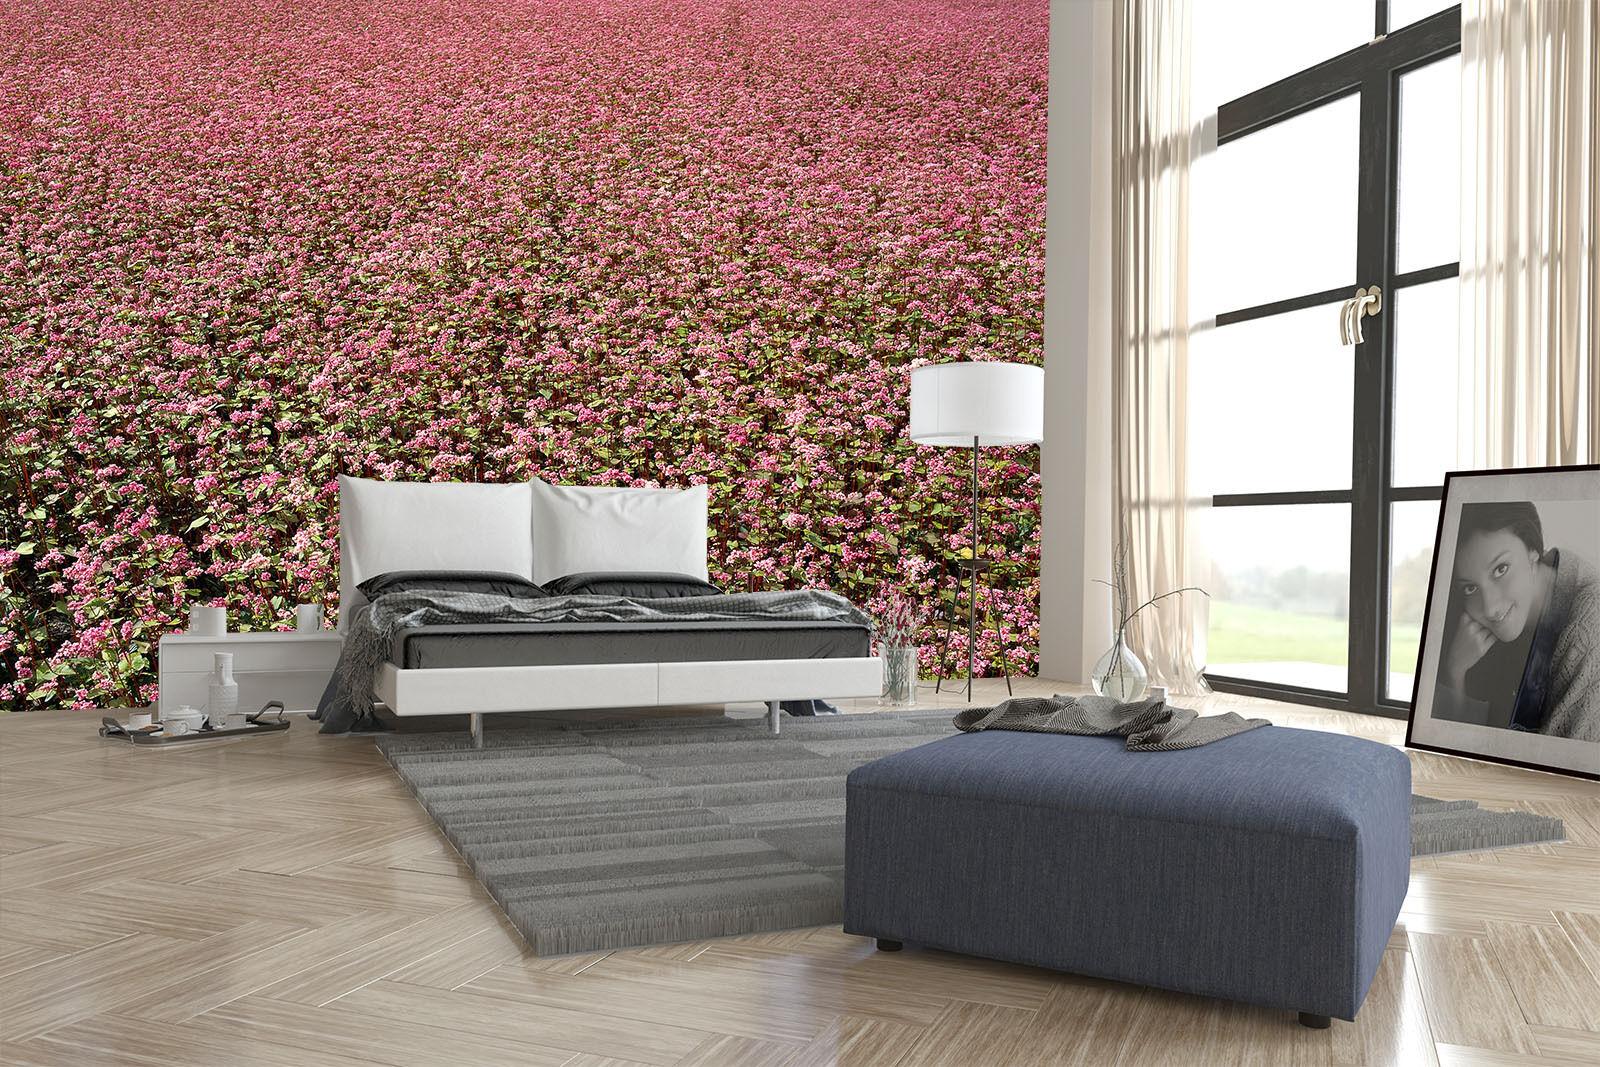 3D pink großen Garten 0098 Fototapeten Wandbild Fototapete BildTapete Familie